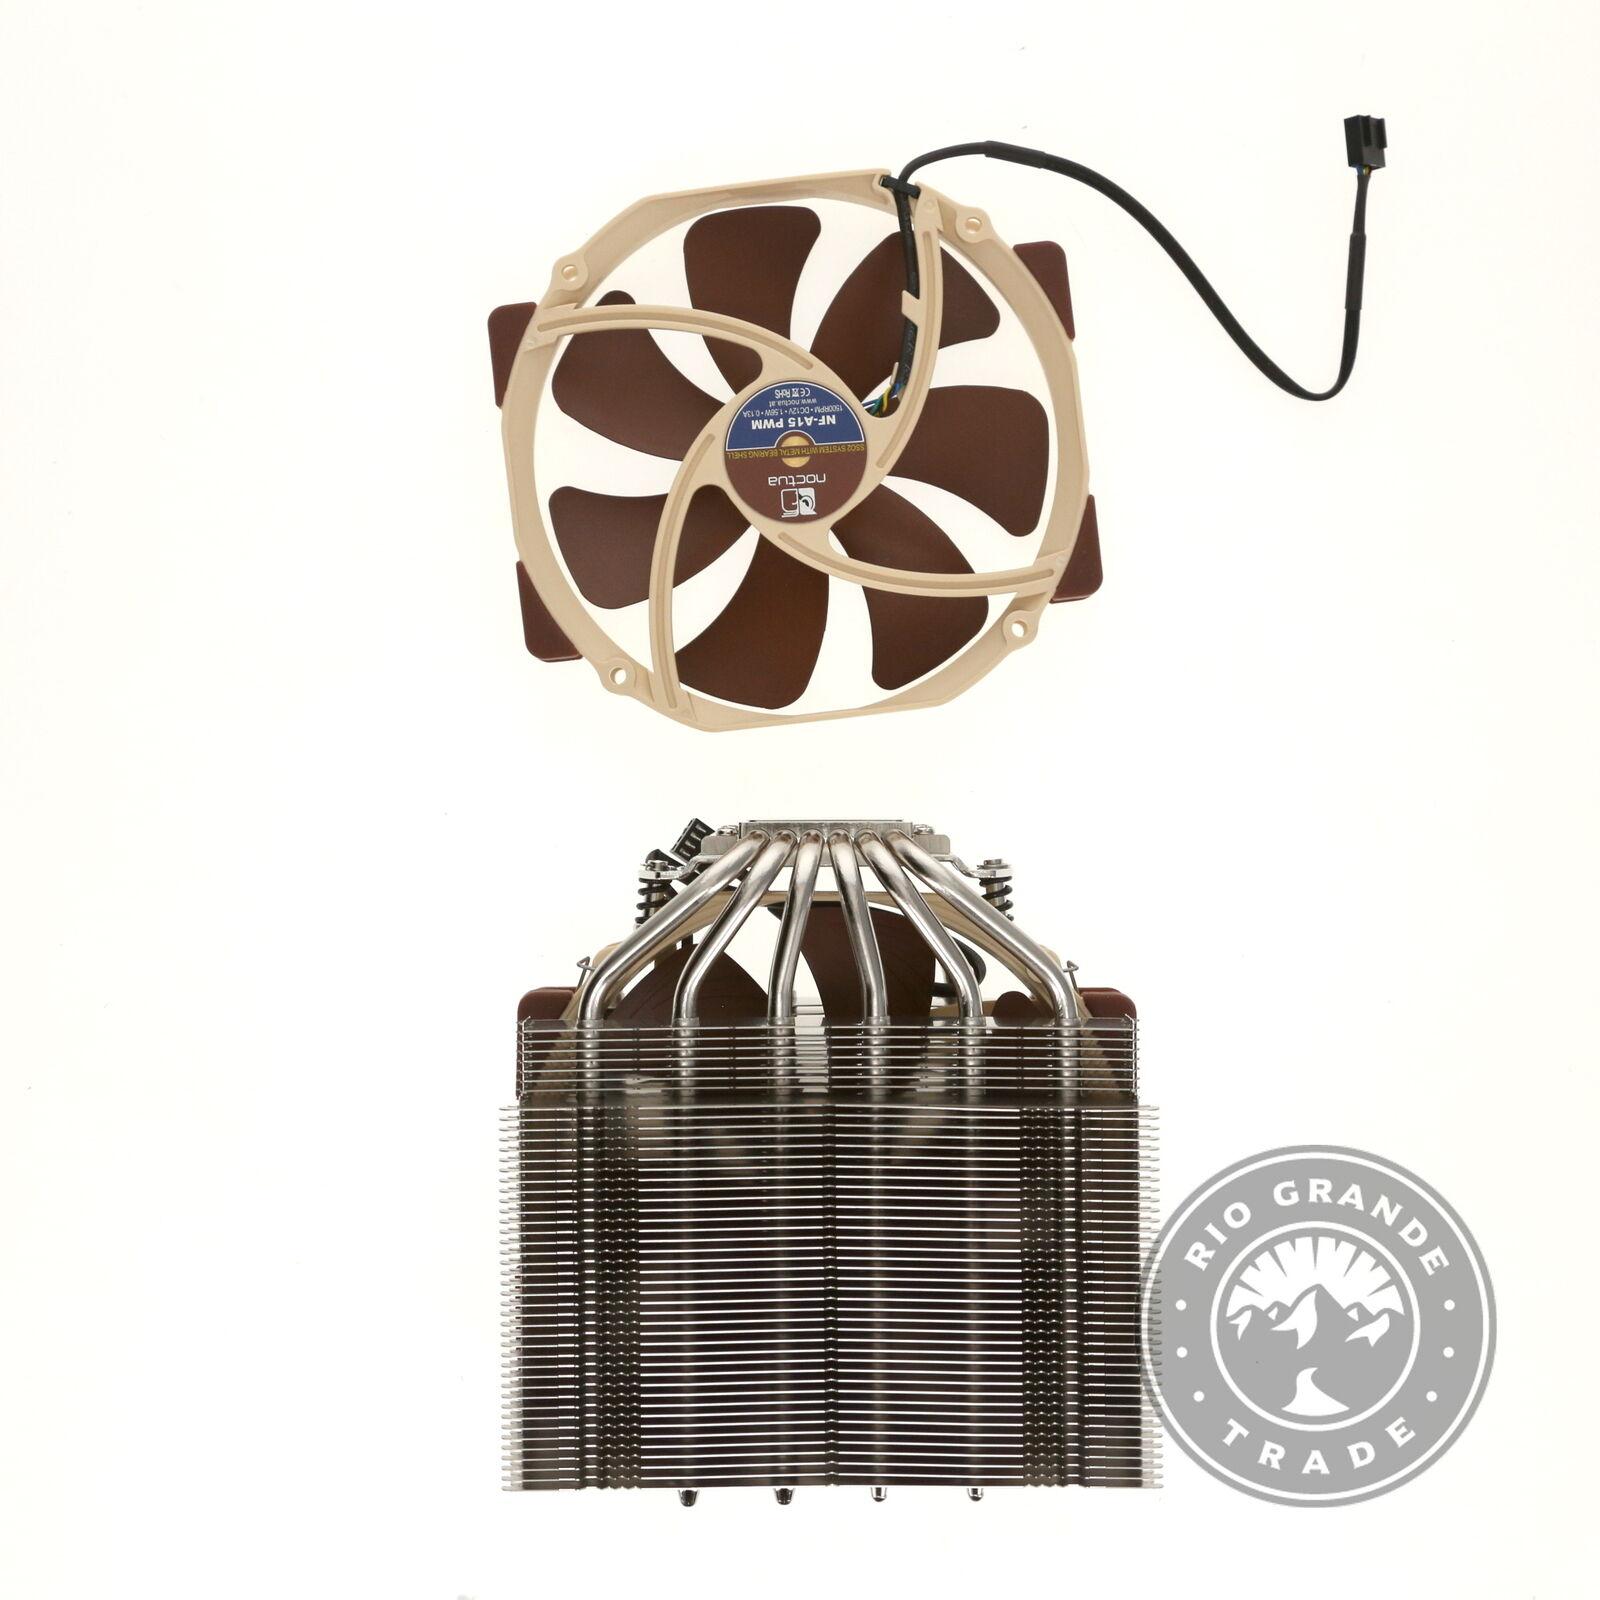 OPEN BOX Noctua NGH-D15 SE-AM4 Premium Dual-Tower CPU Cooler for AMD AM4 - Brown